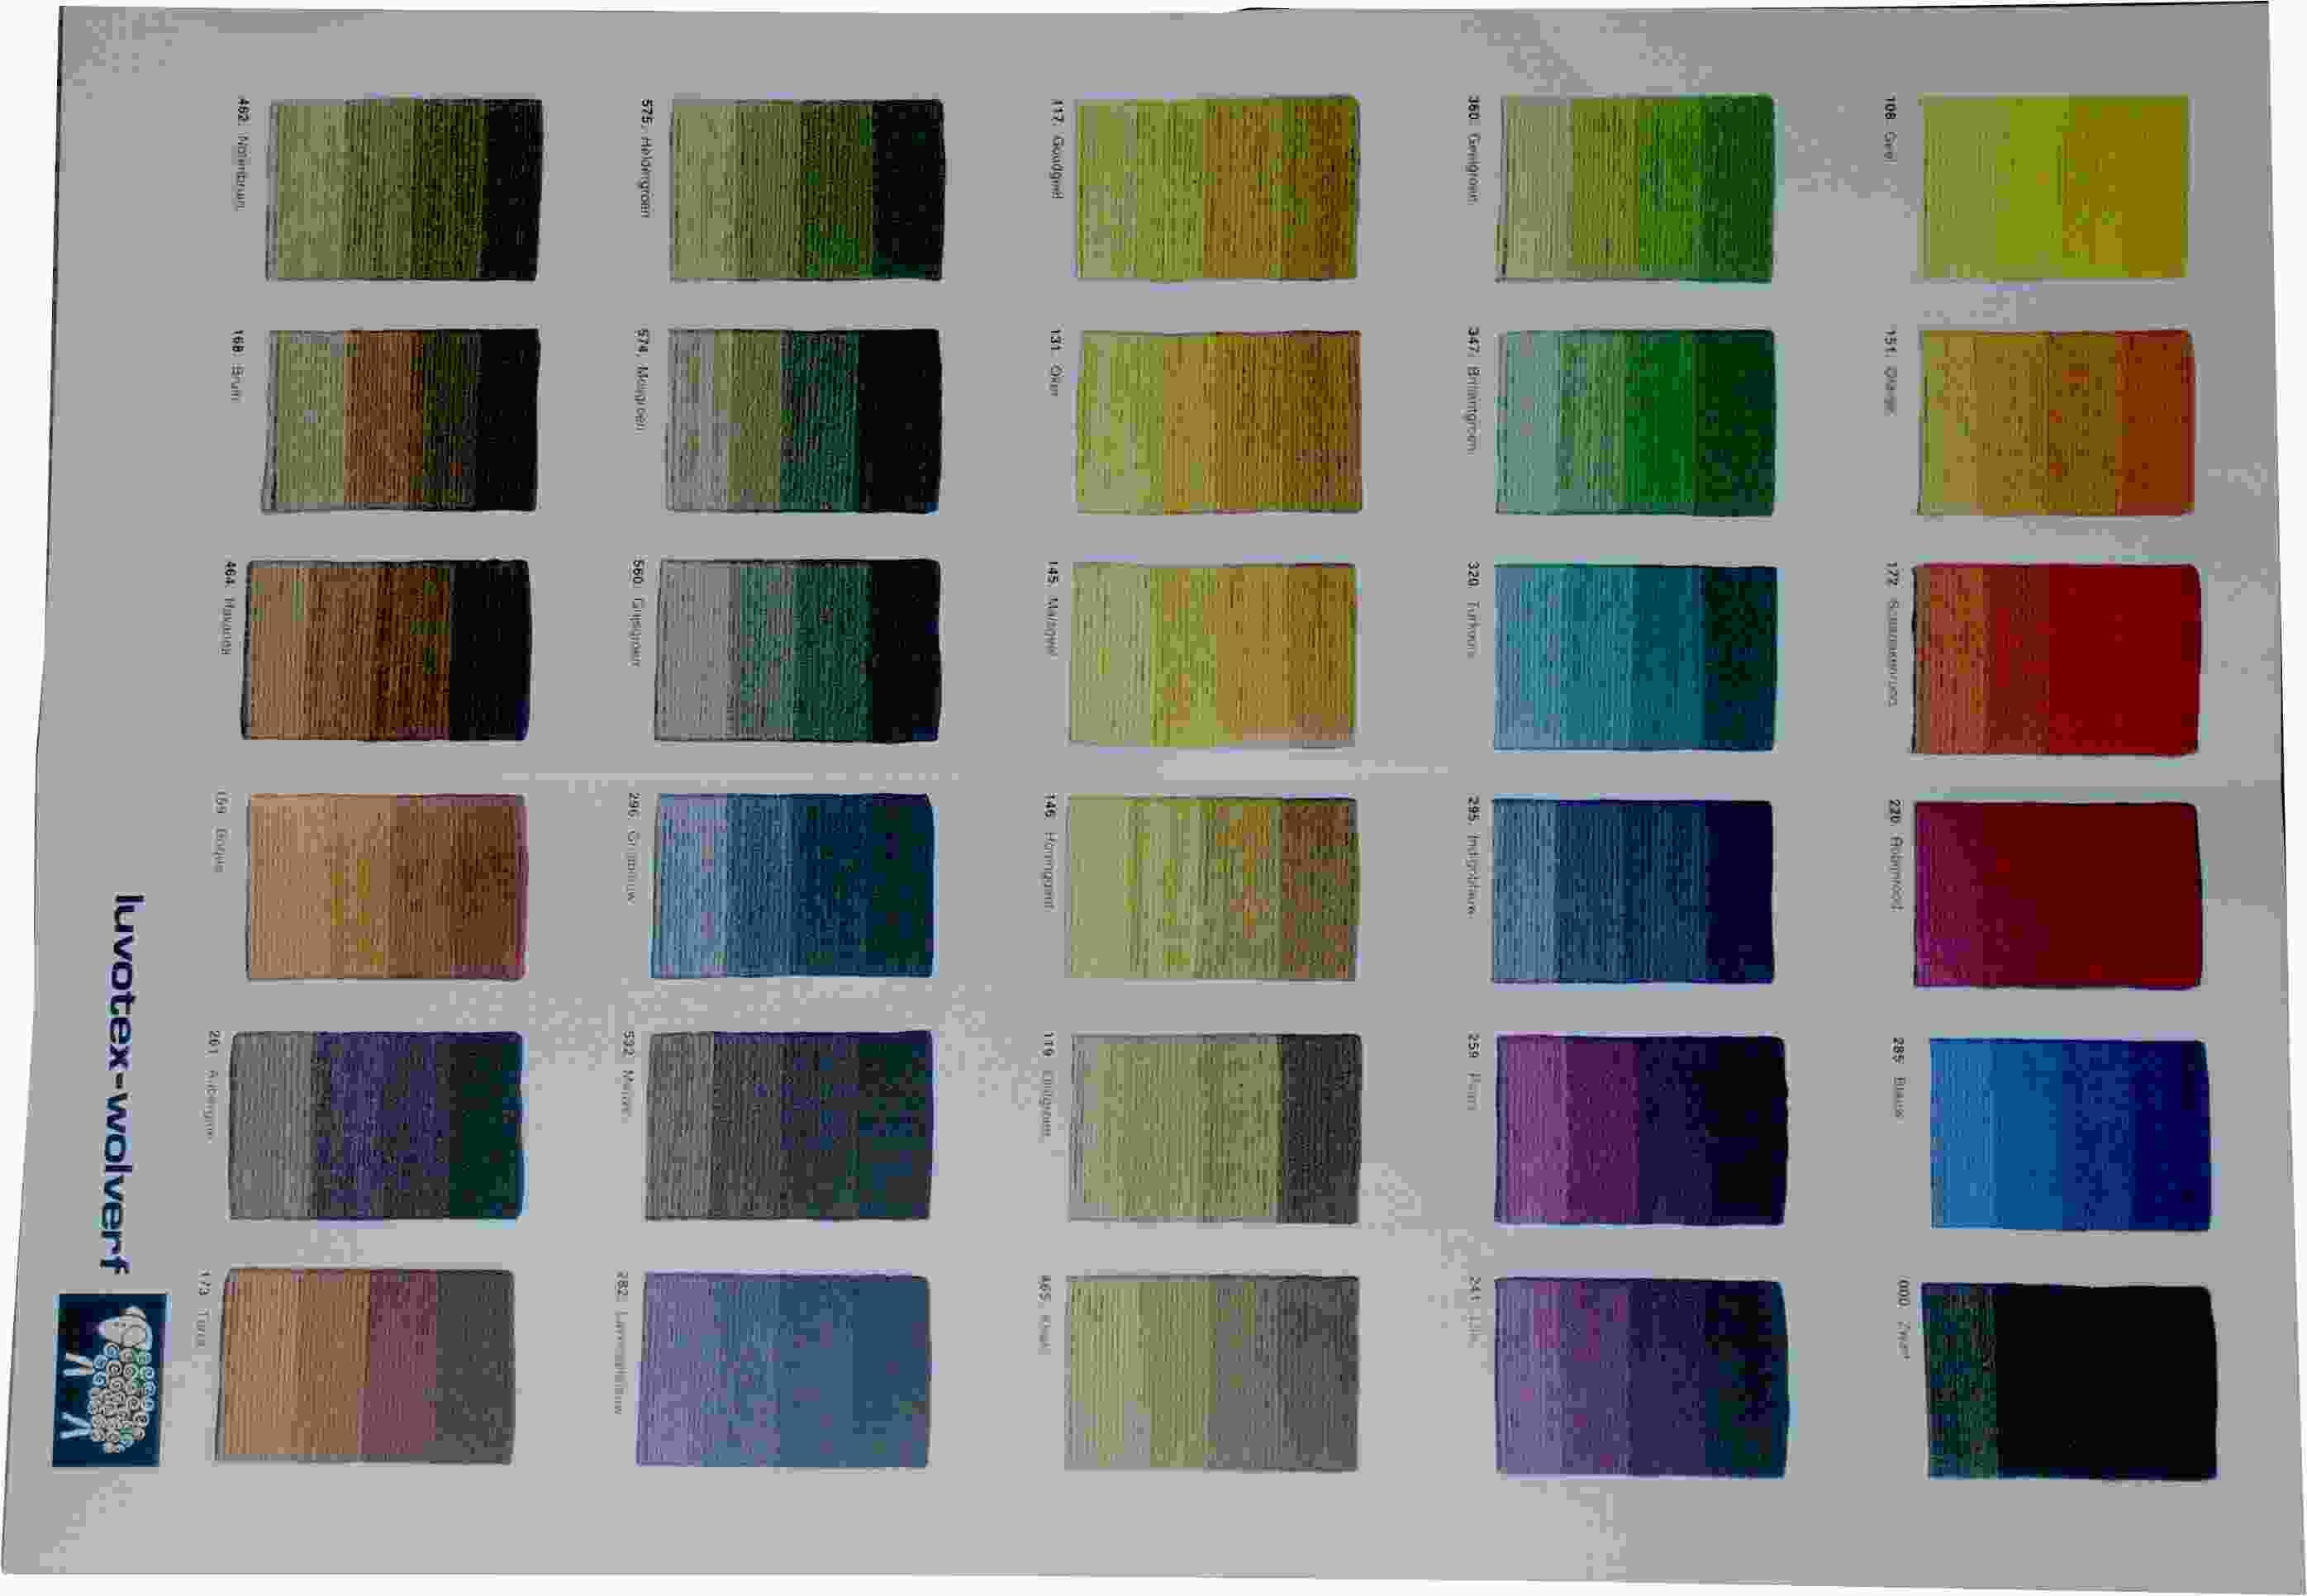 luvotex farbkarte wolle f rben g nstig kaufen. Black Bedroom Furniture Sets. Home Design Ideas